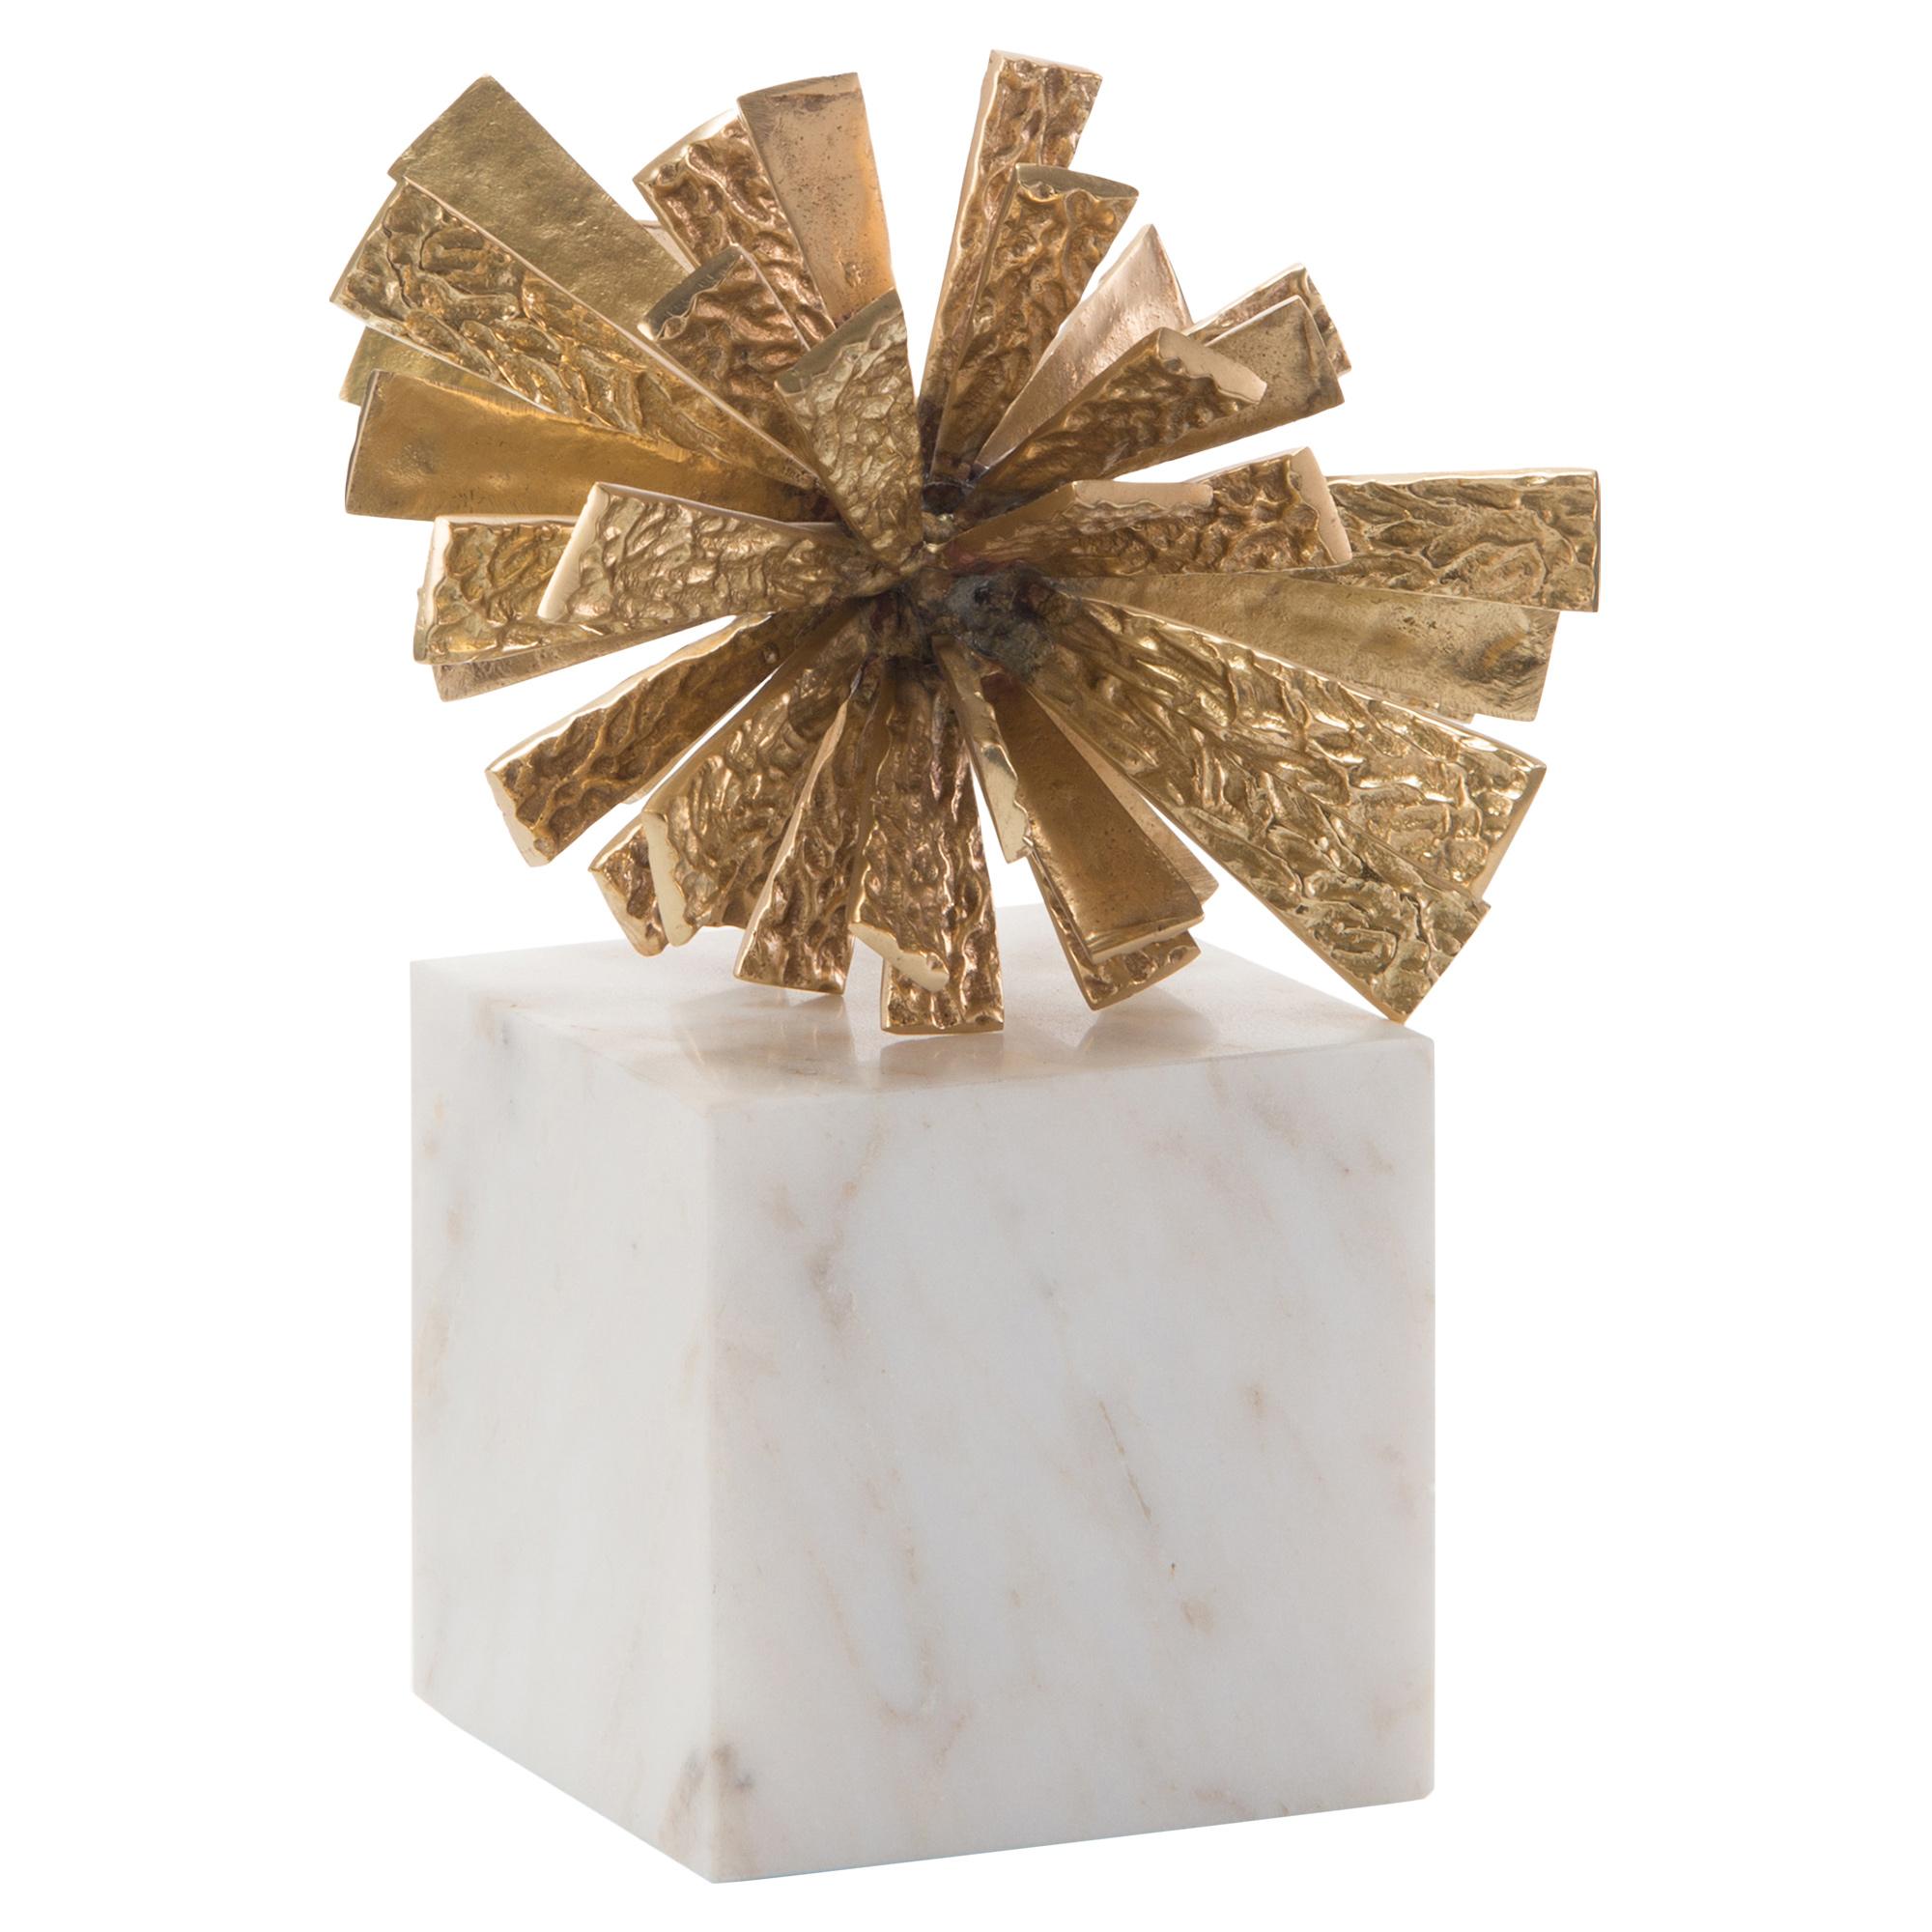 Brass Star Regency White Marble Sculpture